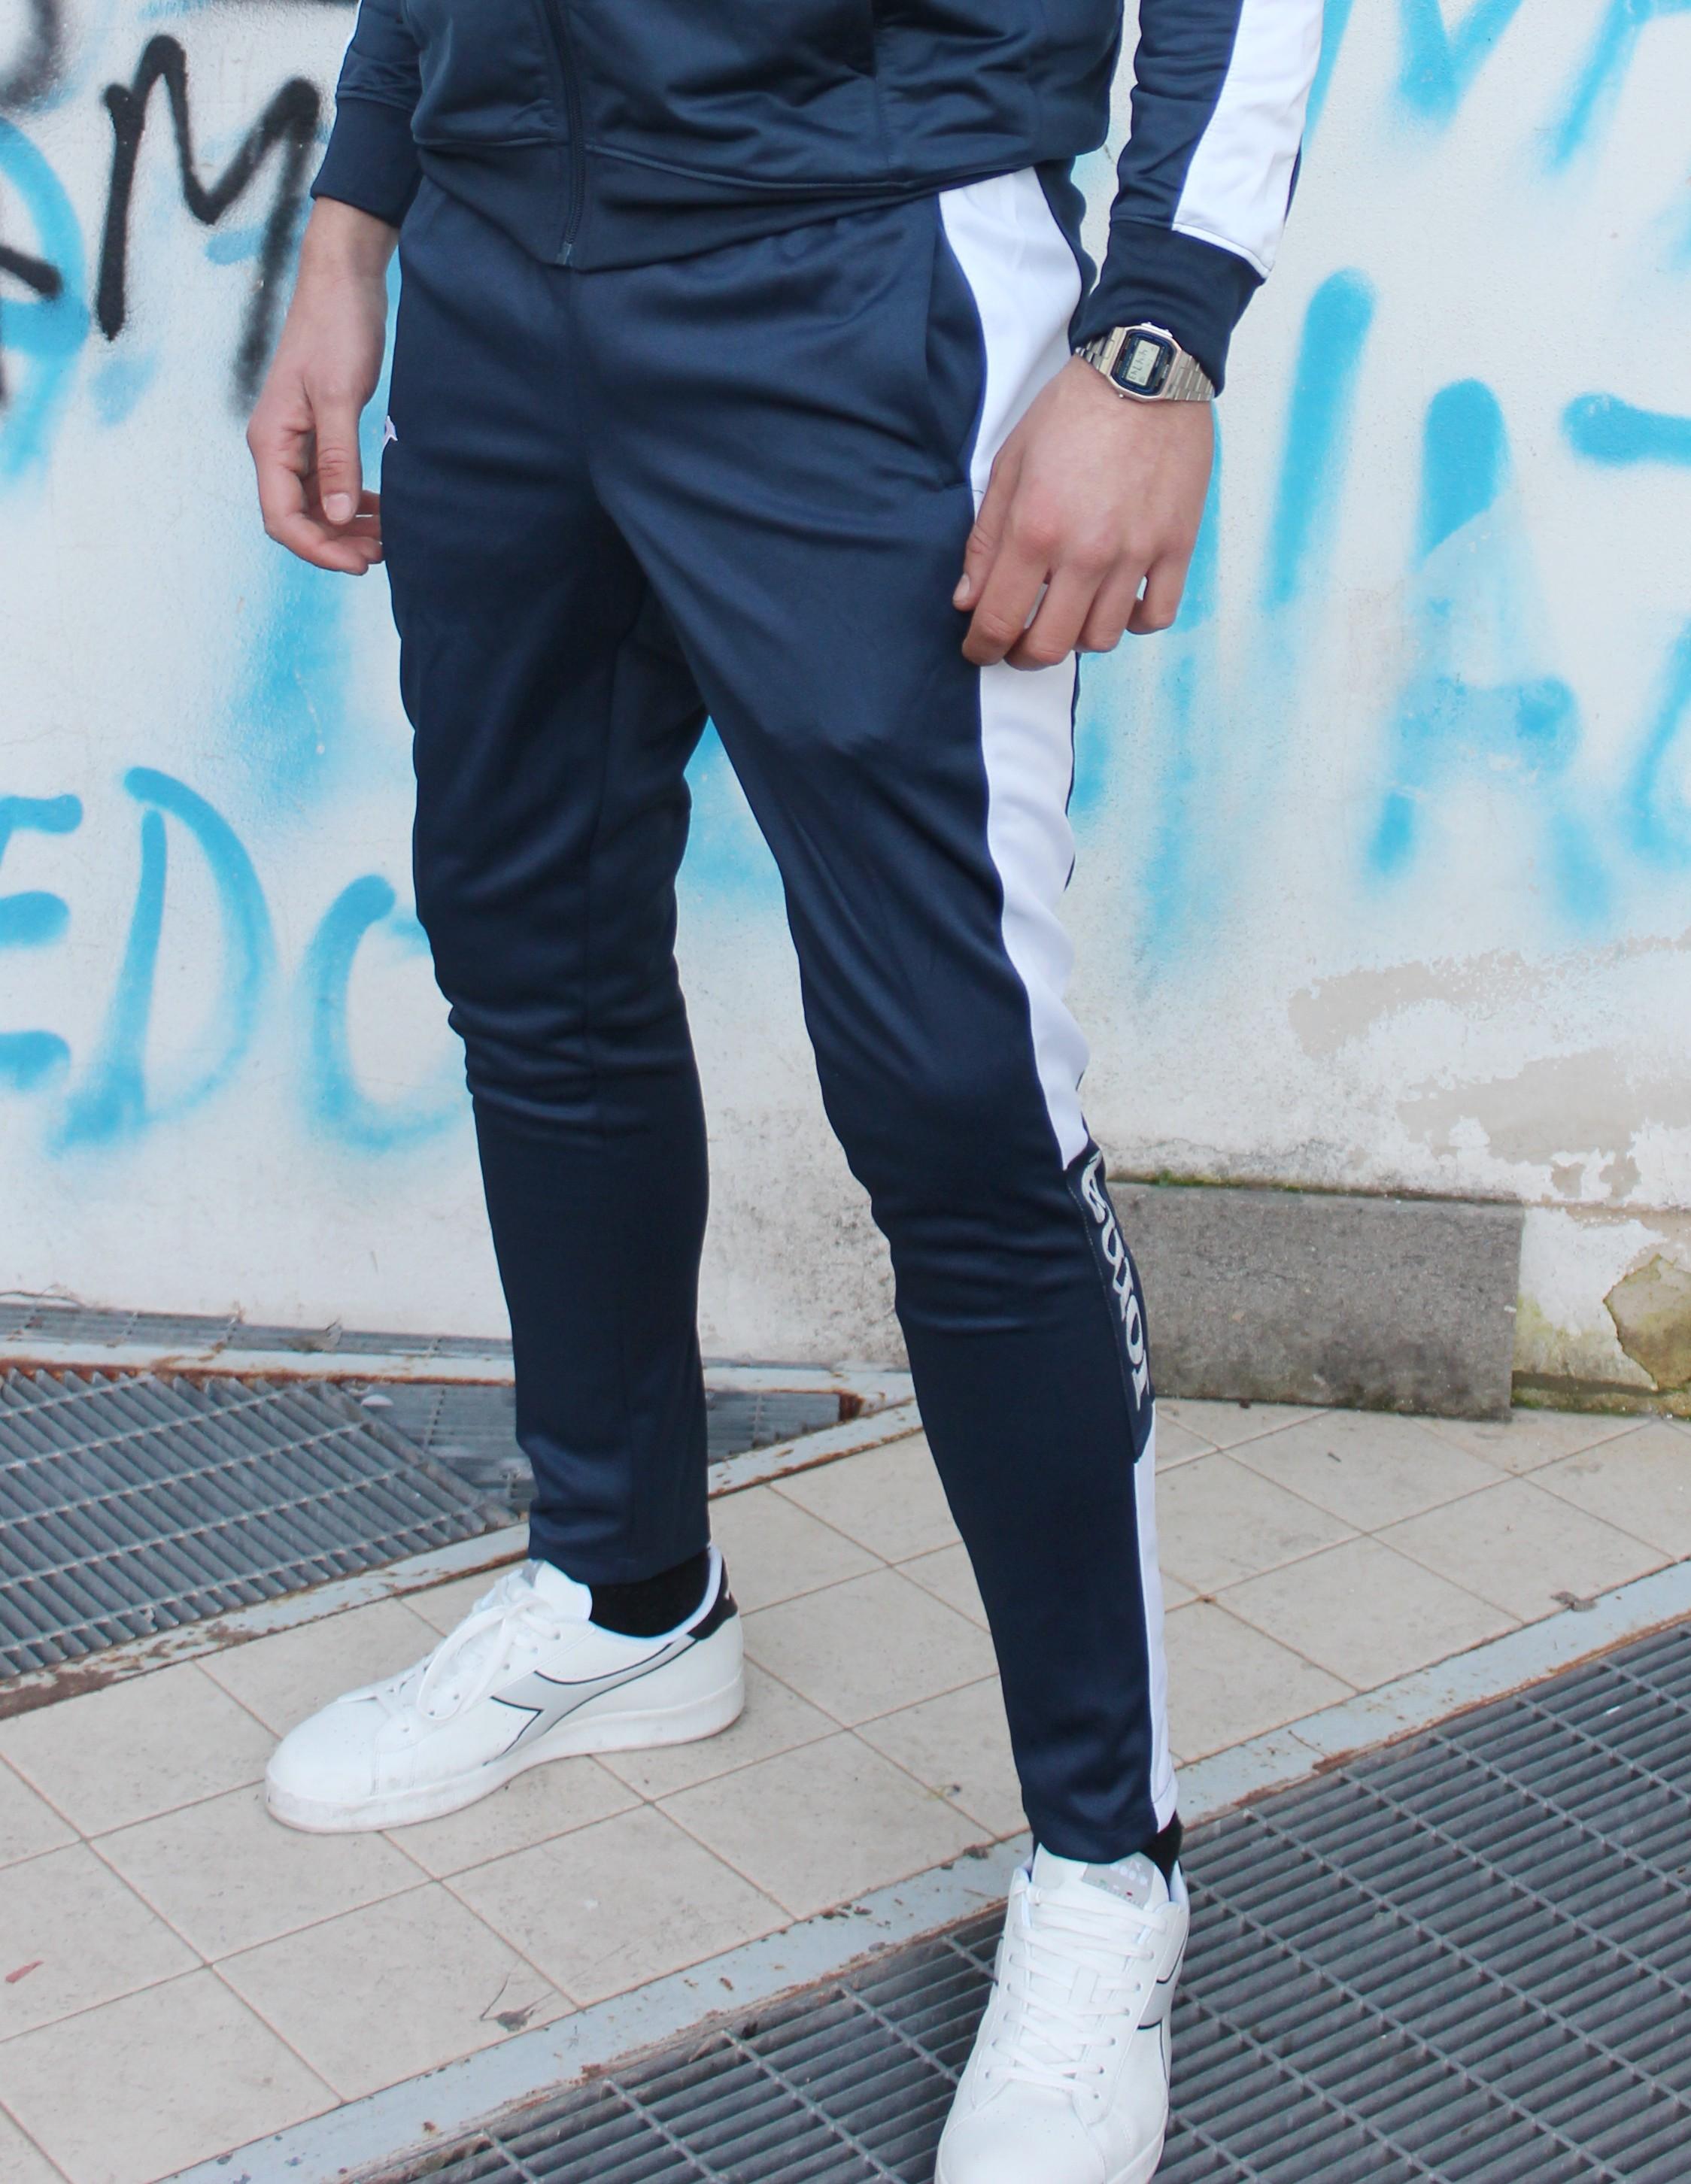 Joma Pantaloni tuta Pants Champion IV con tasche Uomo -Blu Bianco - 3020